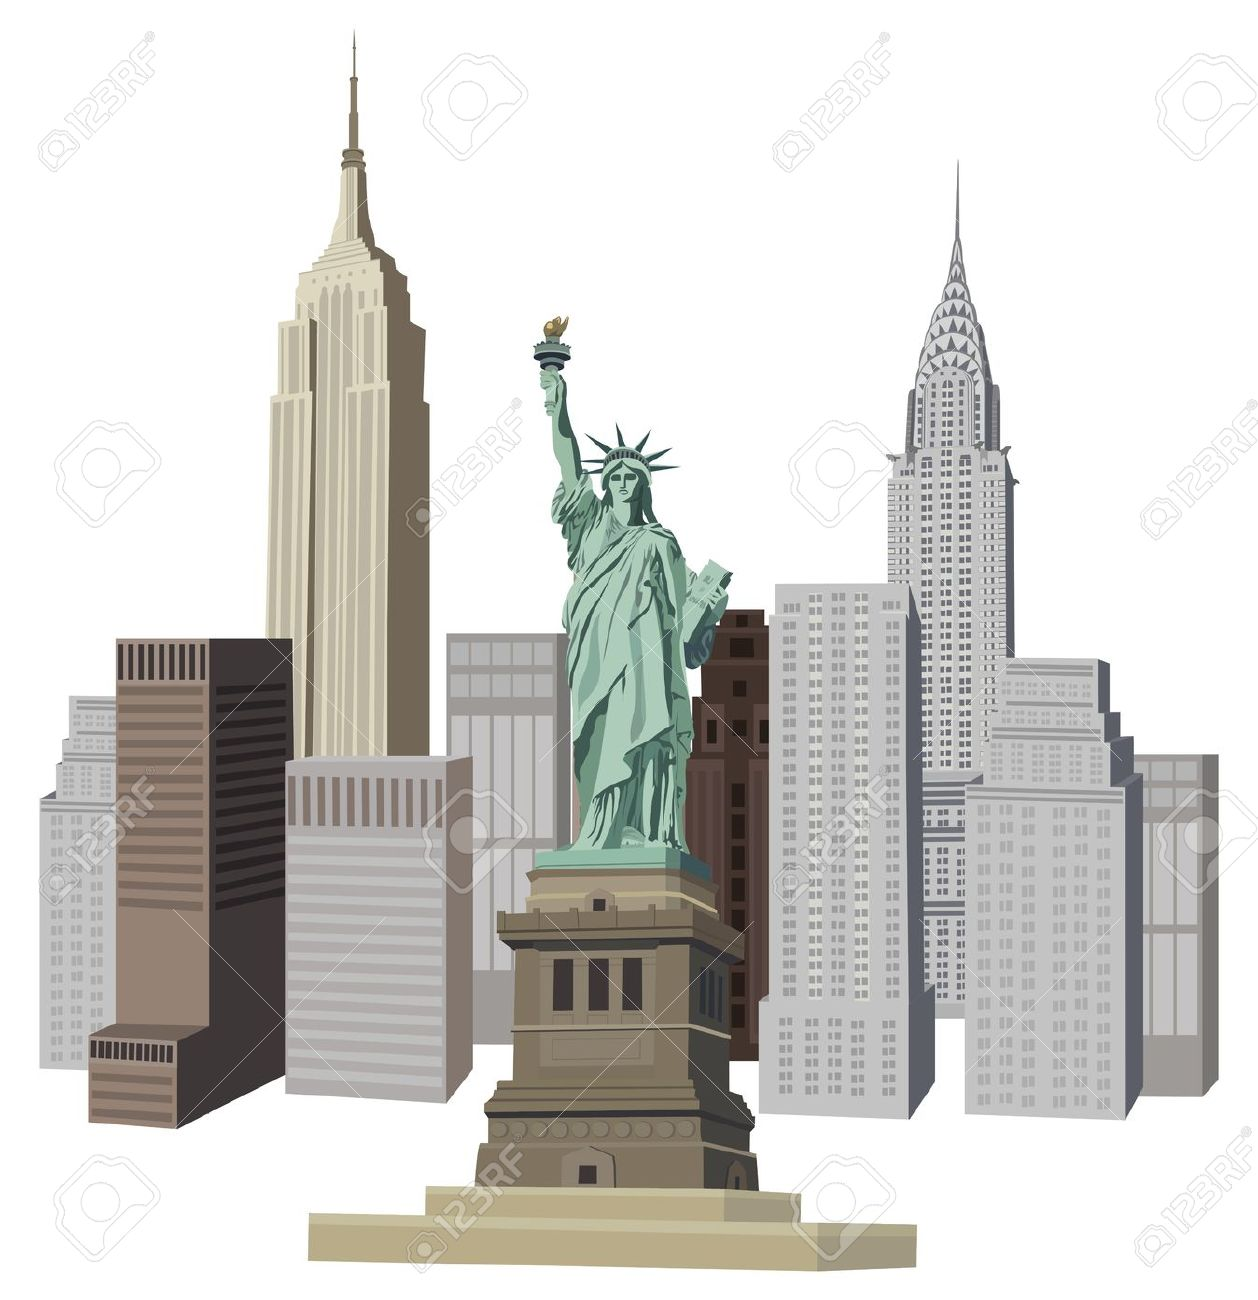 New york buildings clipart.